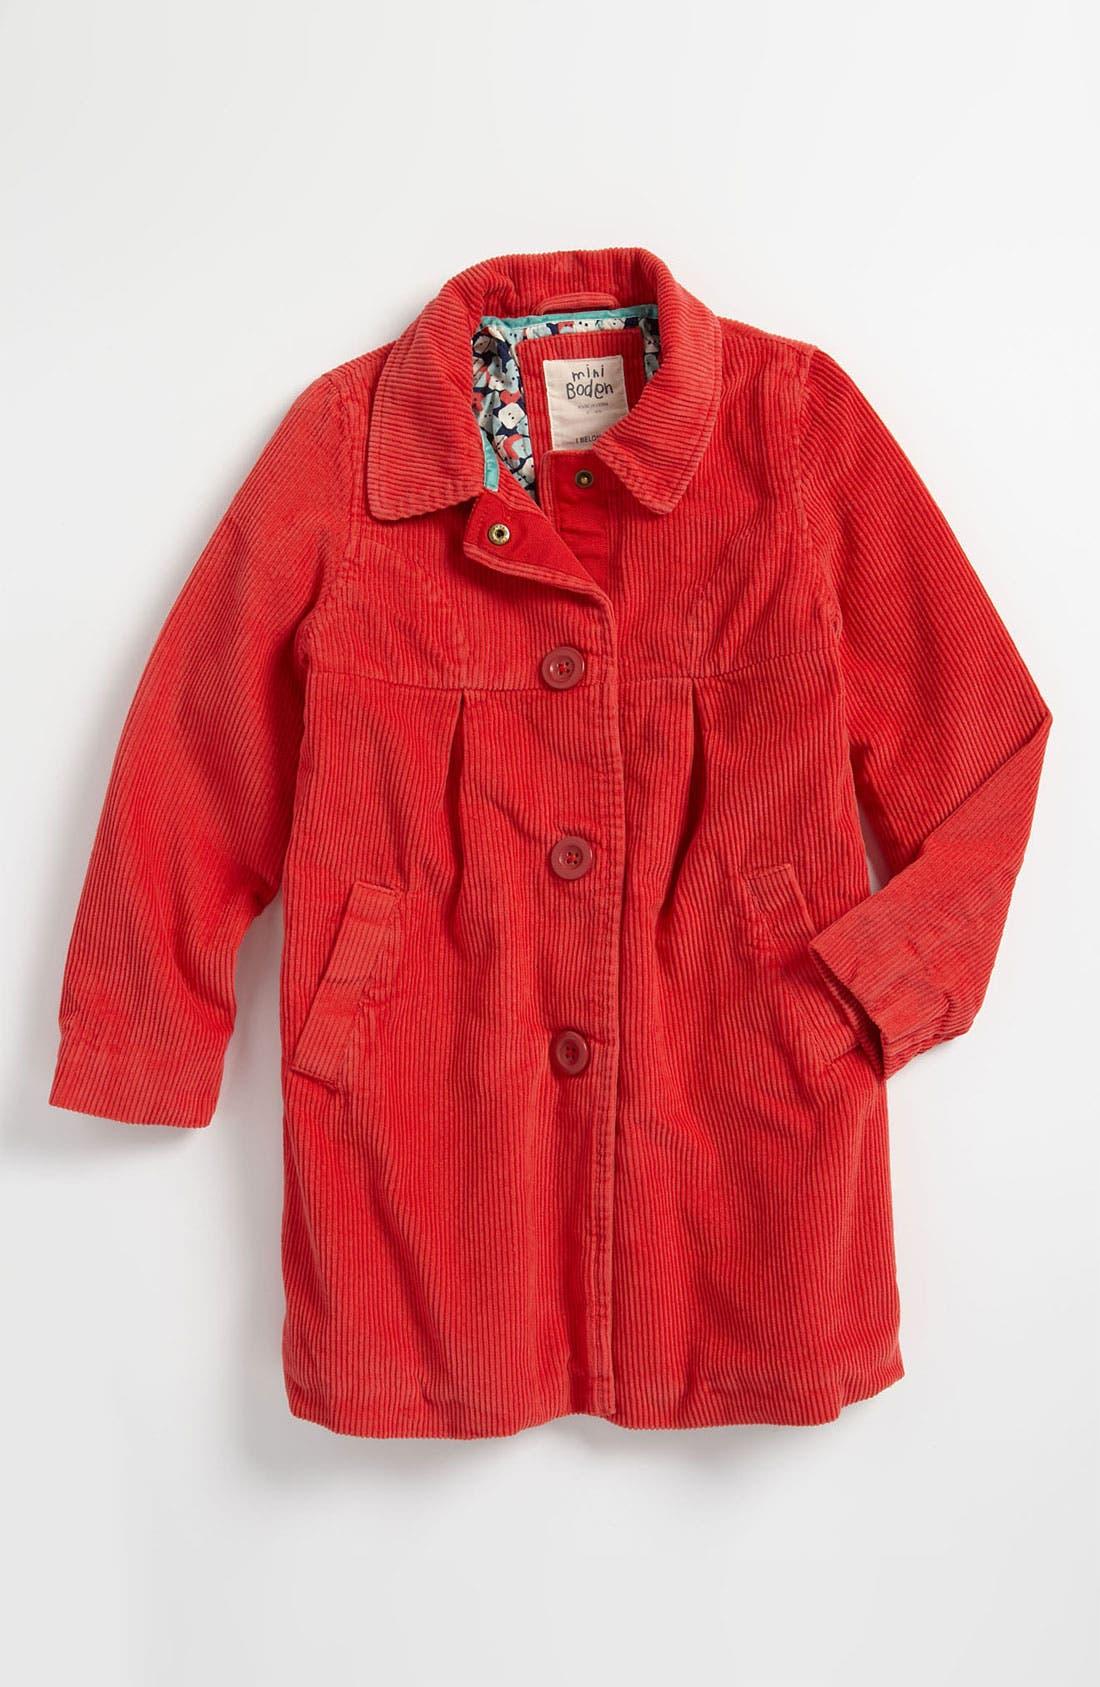 Main Image - Mini Boden 'Fun' Corduroy Coat (Toddler)